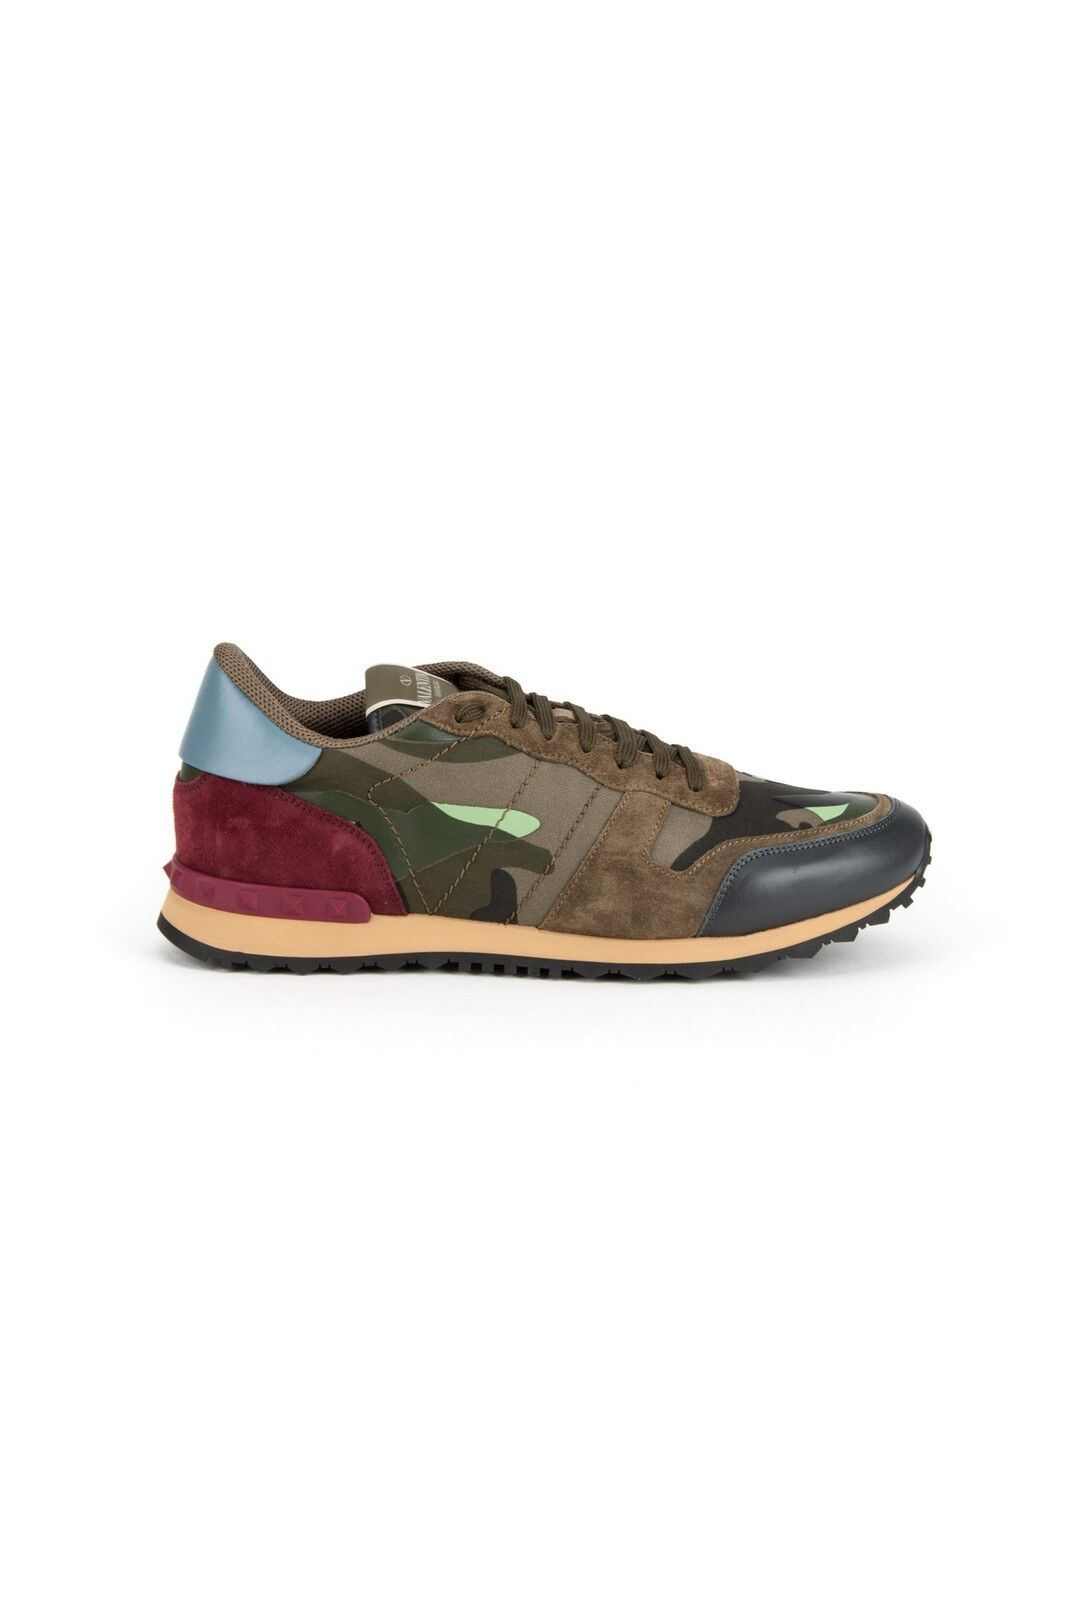 Valentino Schuhe IN % Herren MADE IN Schuhe ITALY Bordeaux KY0S0723TCC-323 520a0e